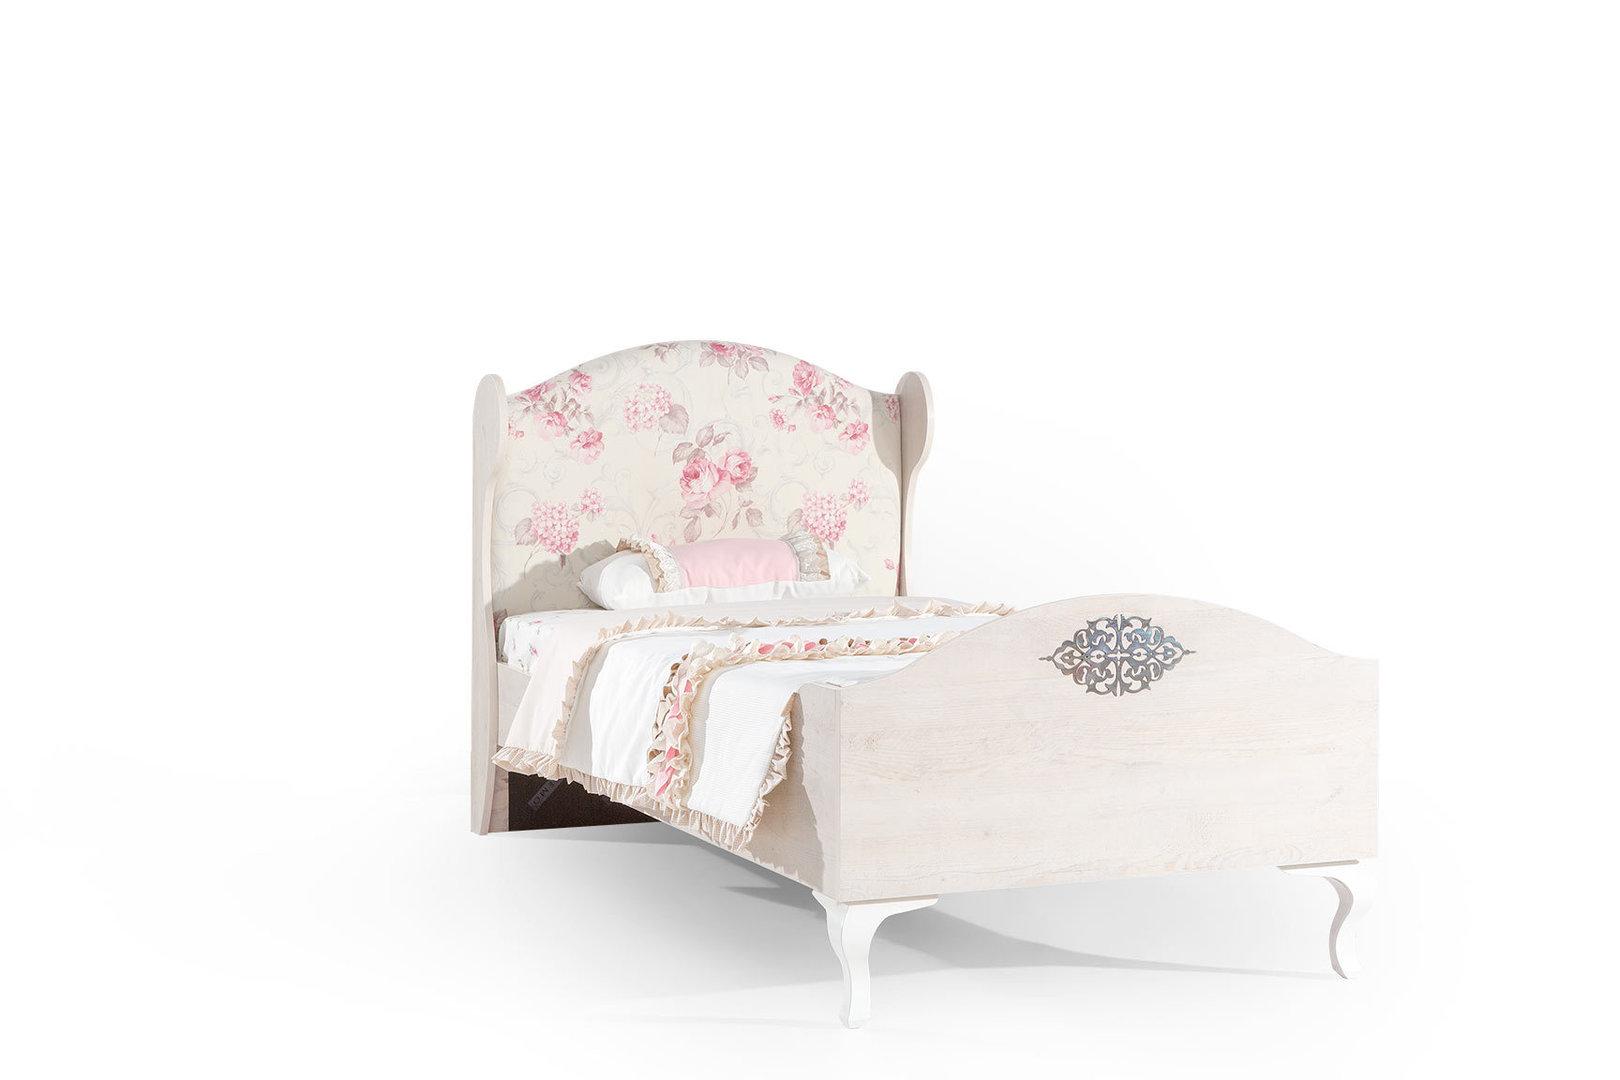 bymm kinderbett ballerina 90 x 200 sonoma eiche precogs. Black Bedroom Furniture Sets. Home Design Ideas